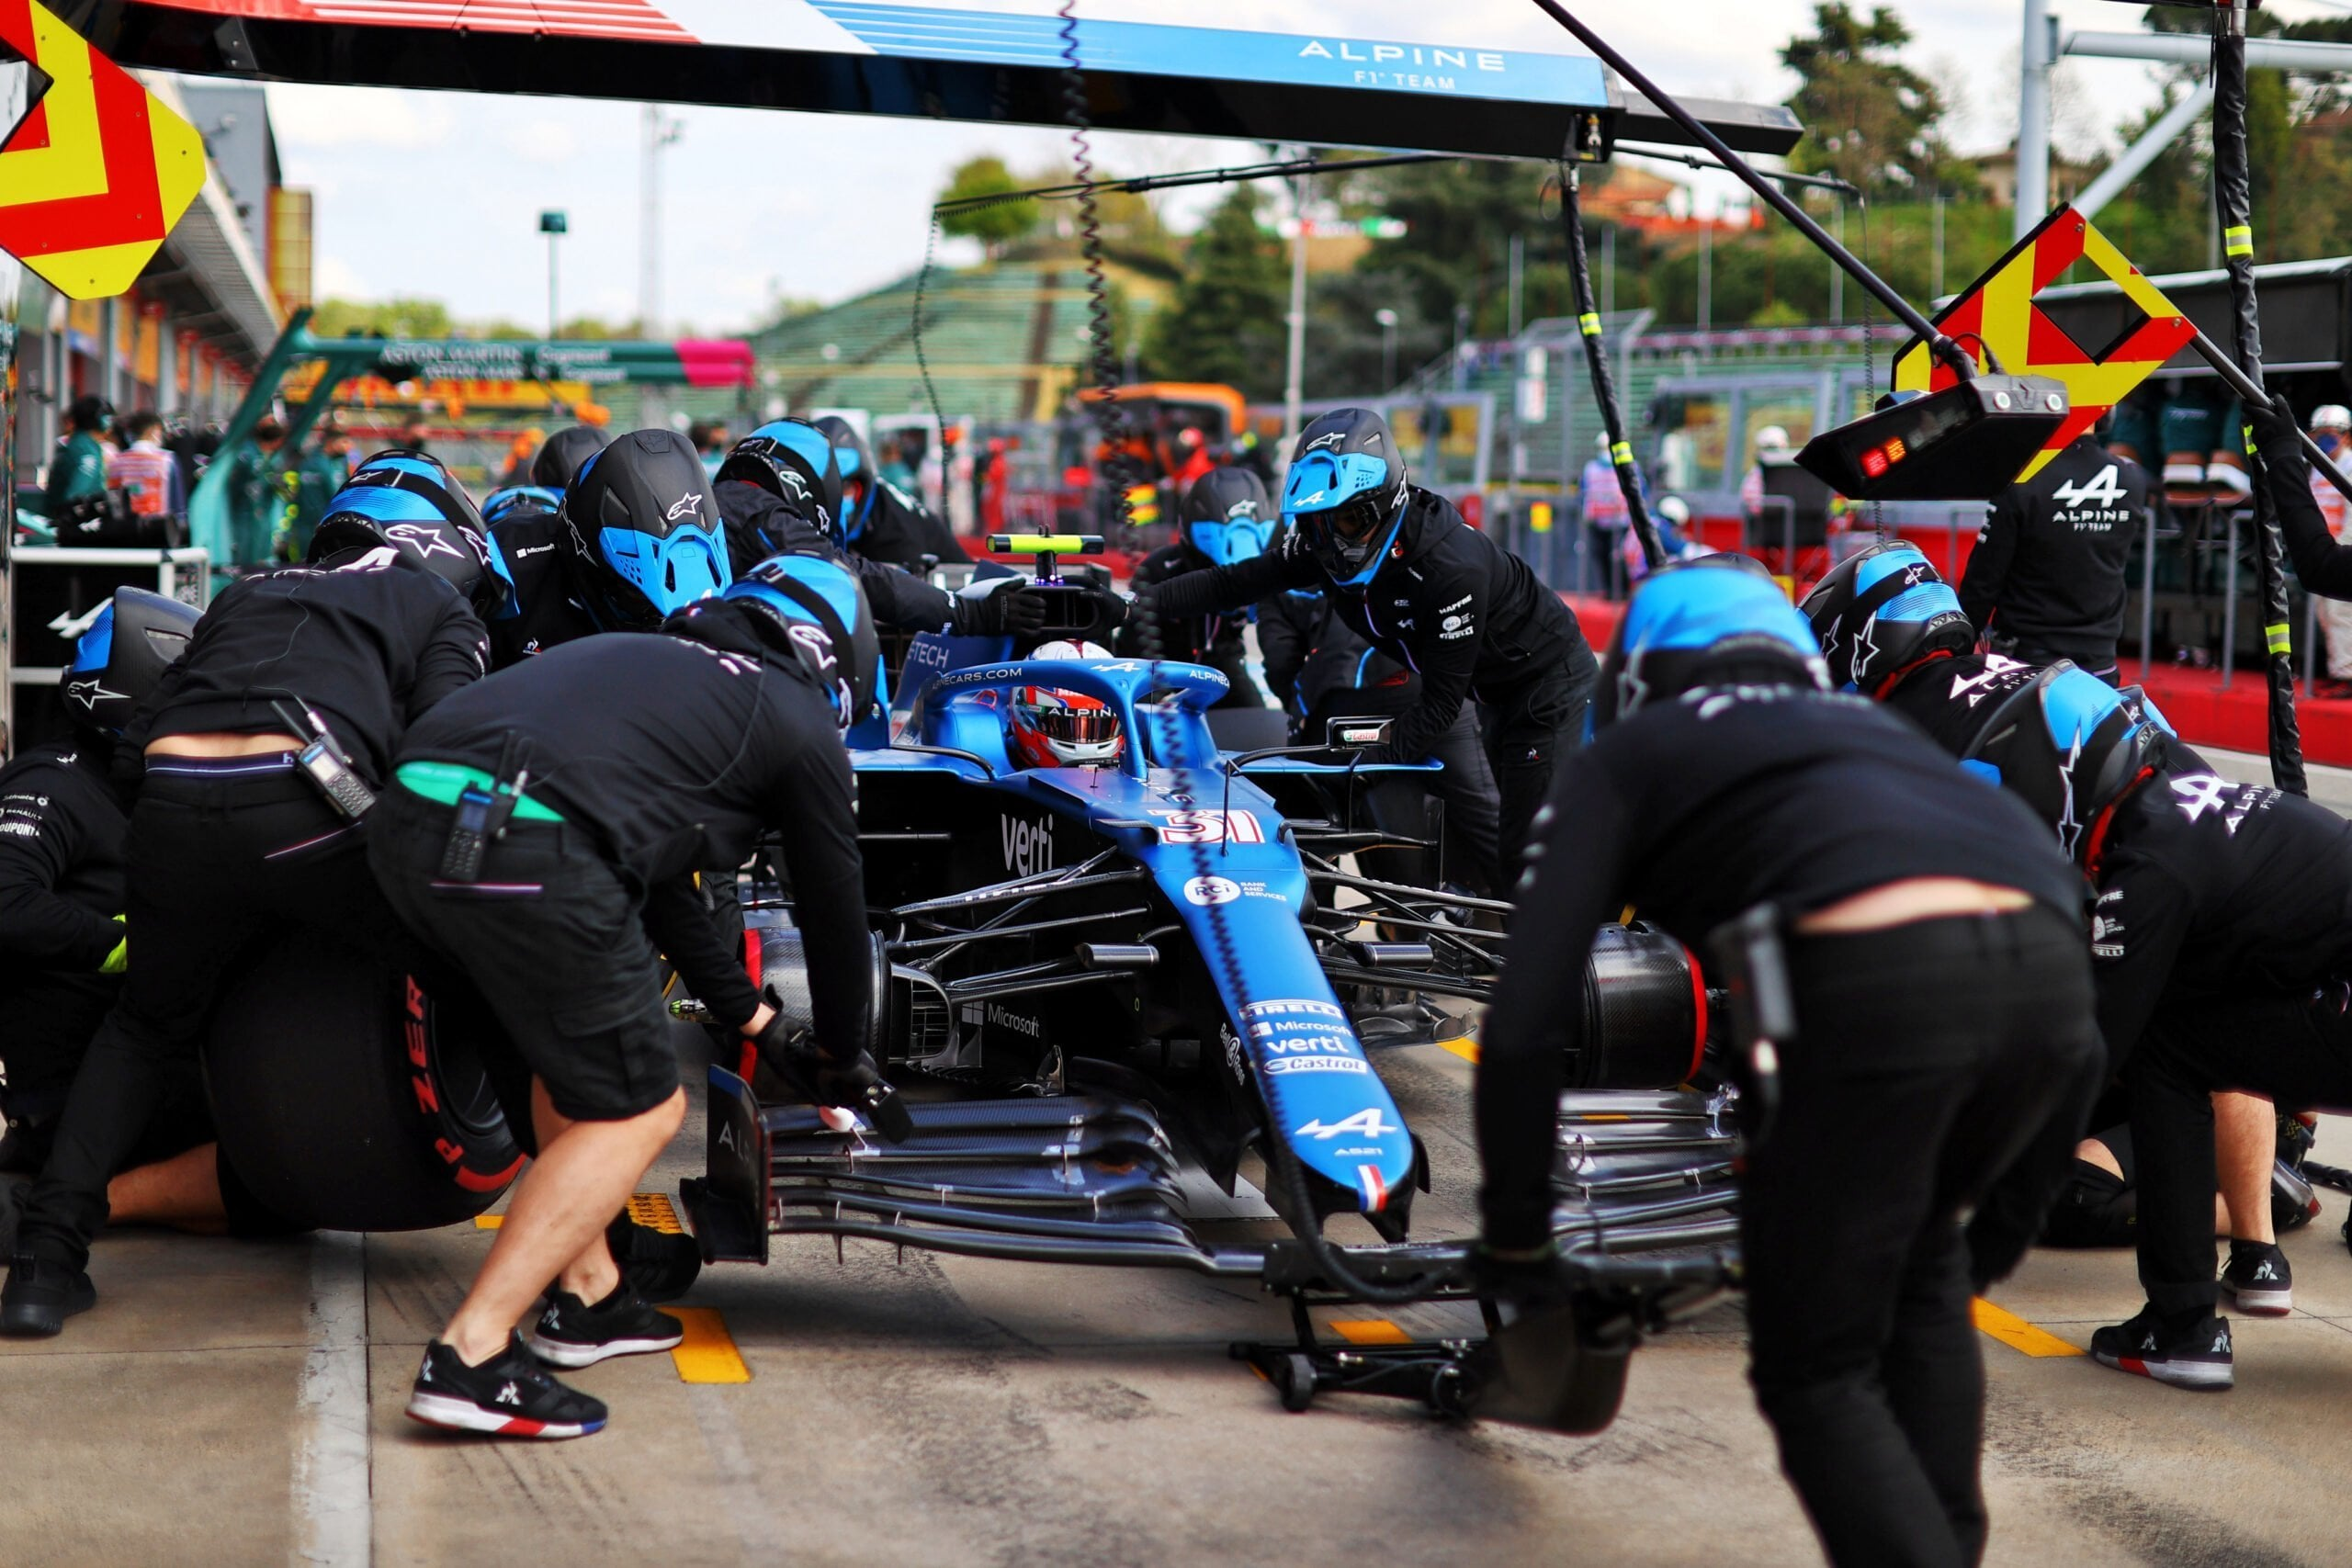 Alpine F1 Team A521 Alonso Ocon Brivio Permane Imola 2021 Test 21 scaled   Alpine F1 Team : Ocon en Q3 et Alonso en Q2 au GP d'Emilie Romagne